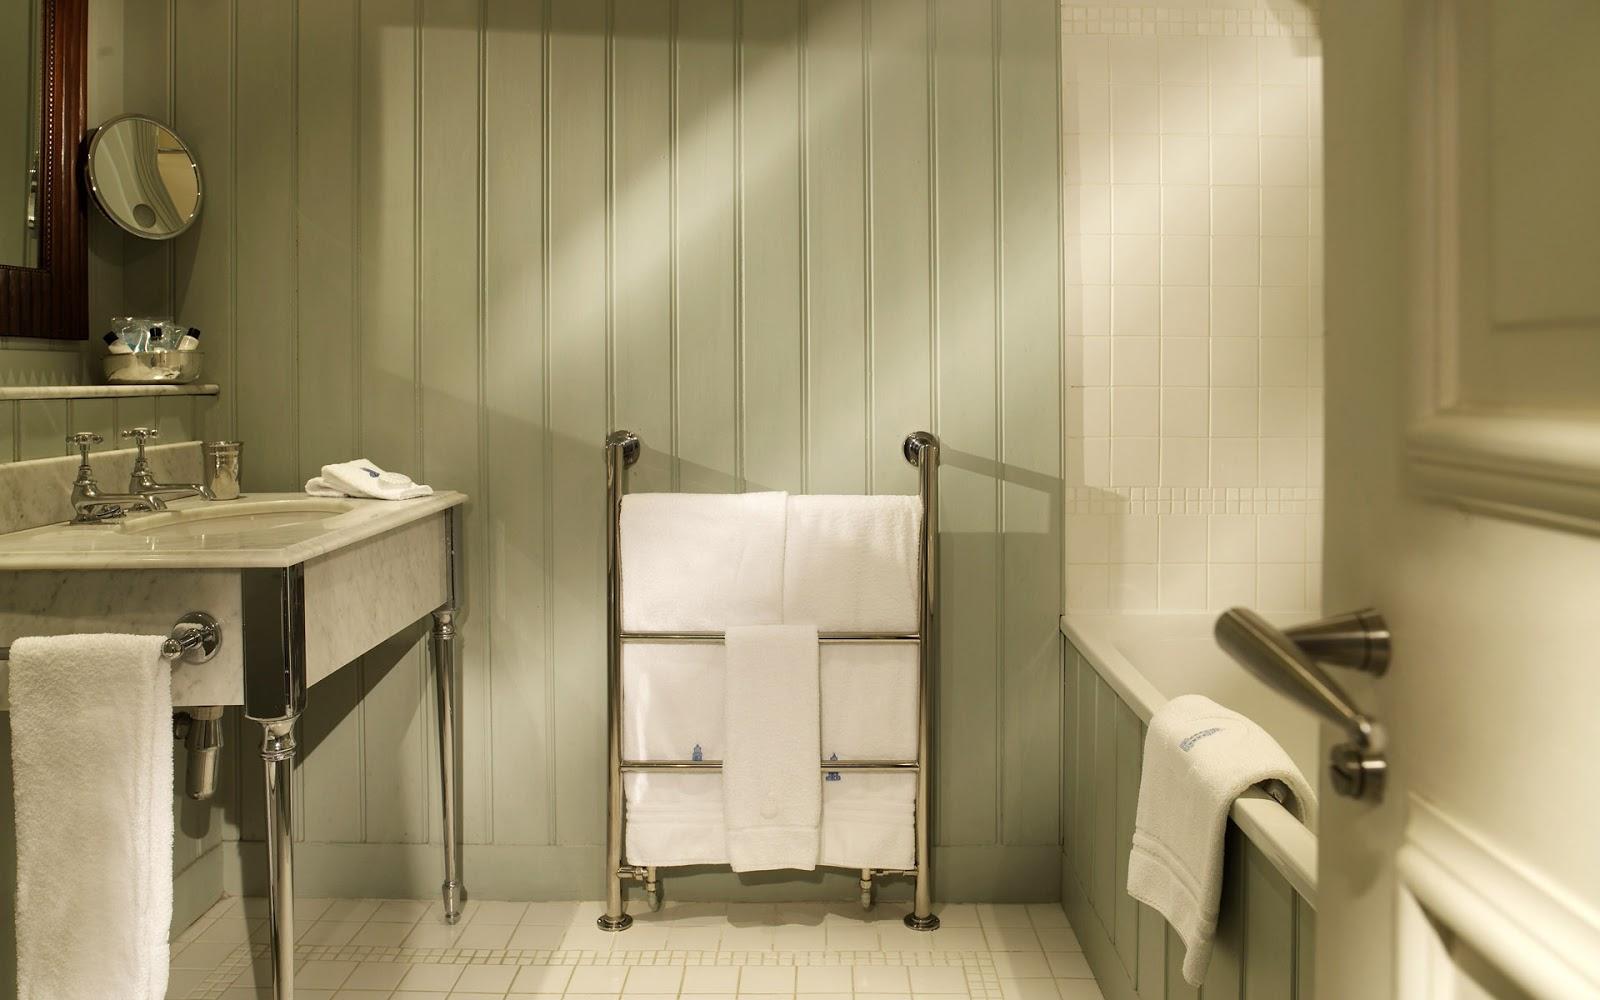 Bathrooms Designs images cool bathrooms luxury bathrooms 1600x1000